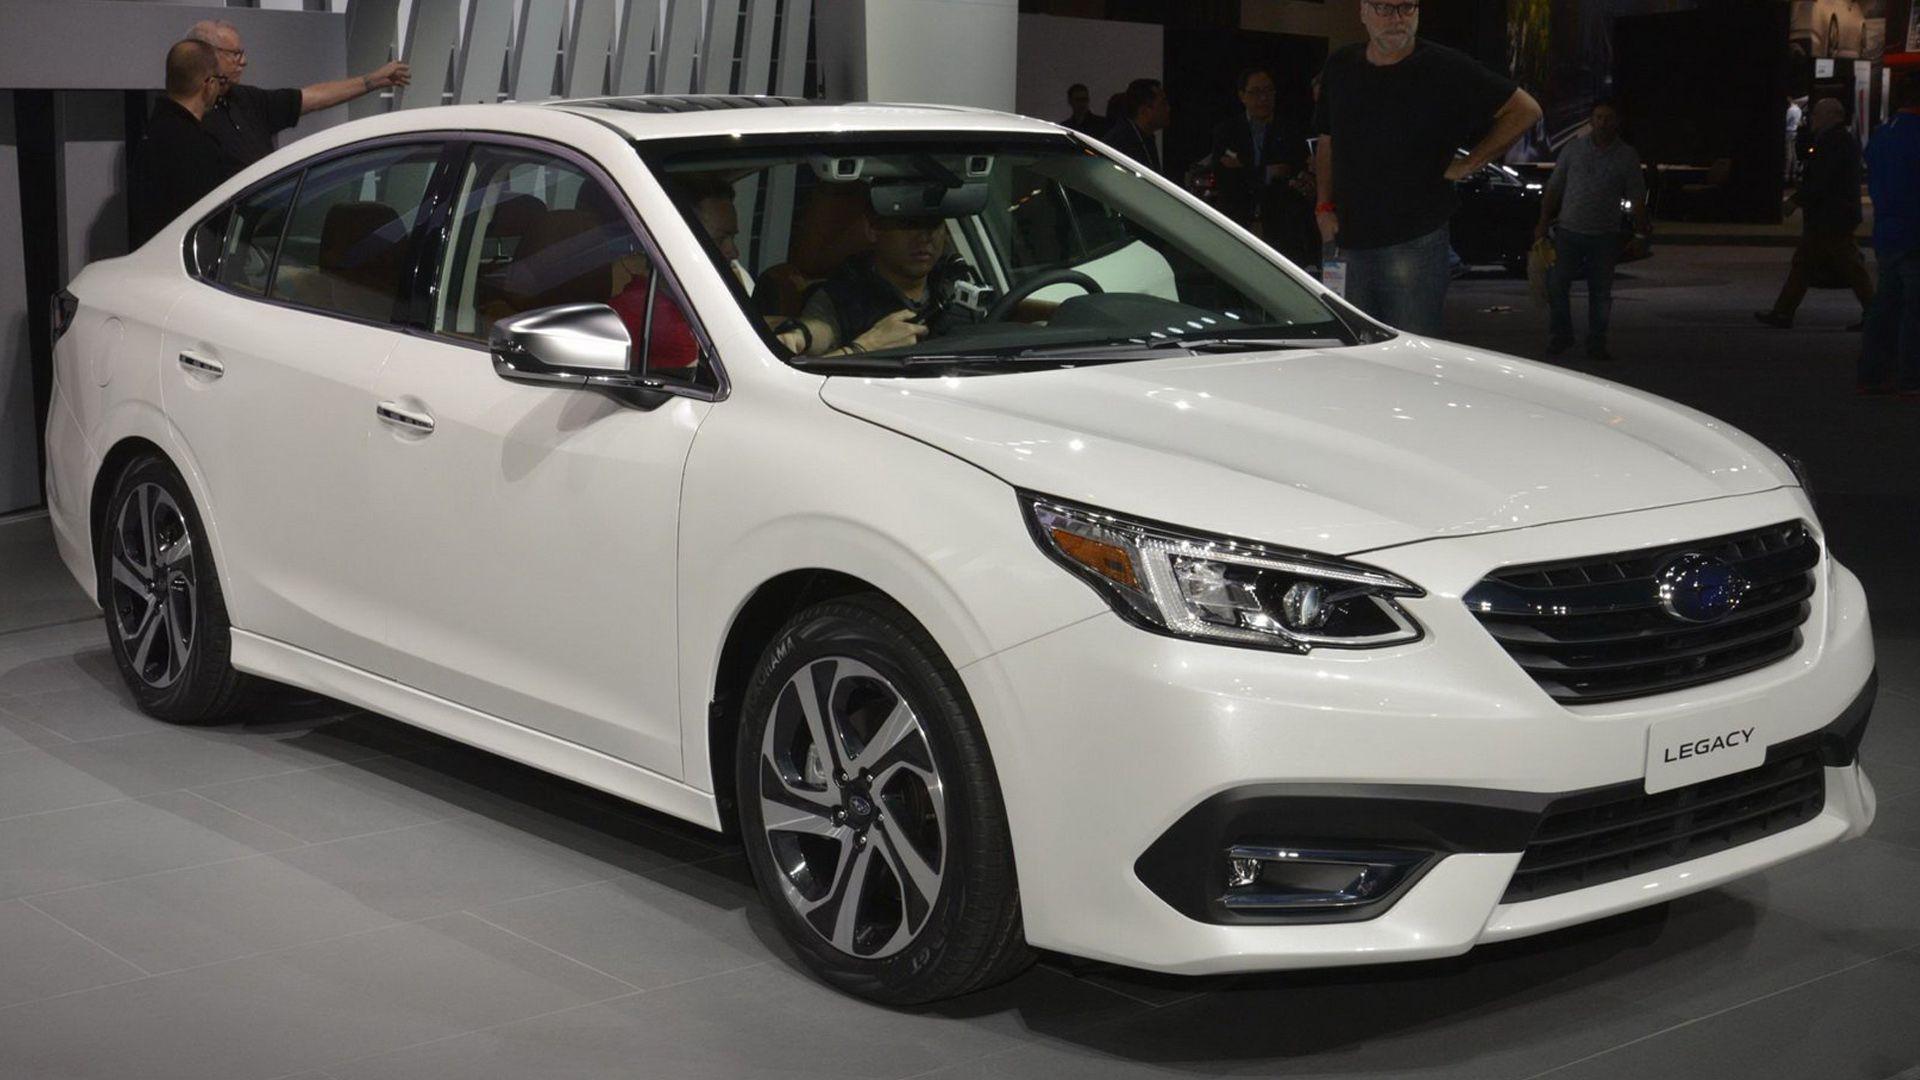 2020 Subaru Legacy Subaru Legacy Subaru Life Skills Special Education